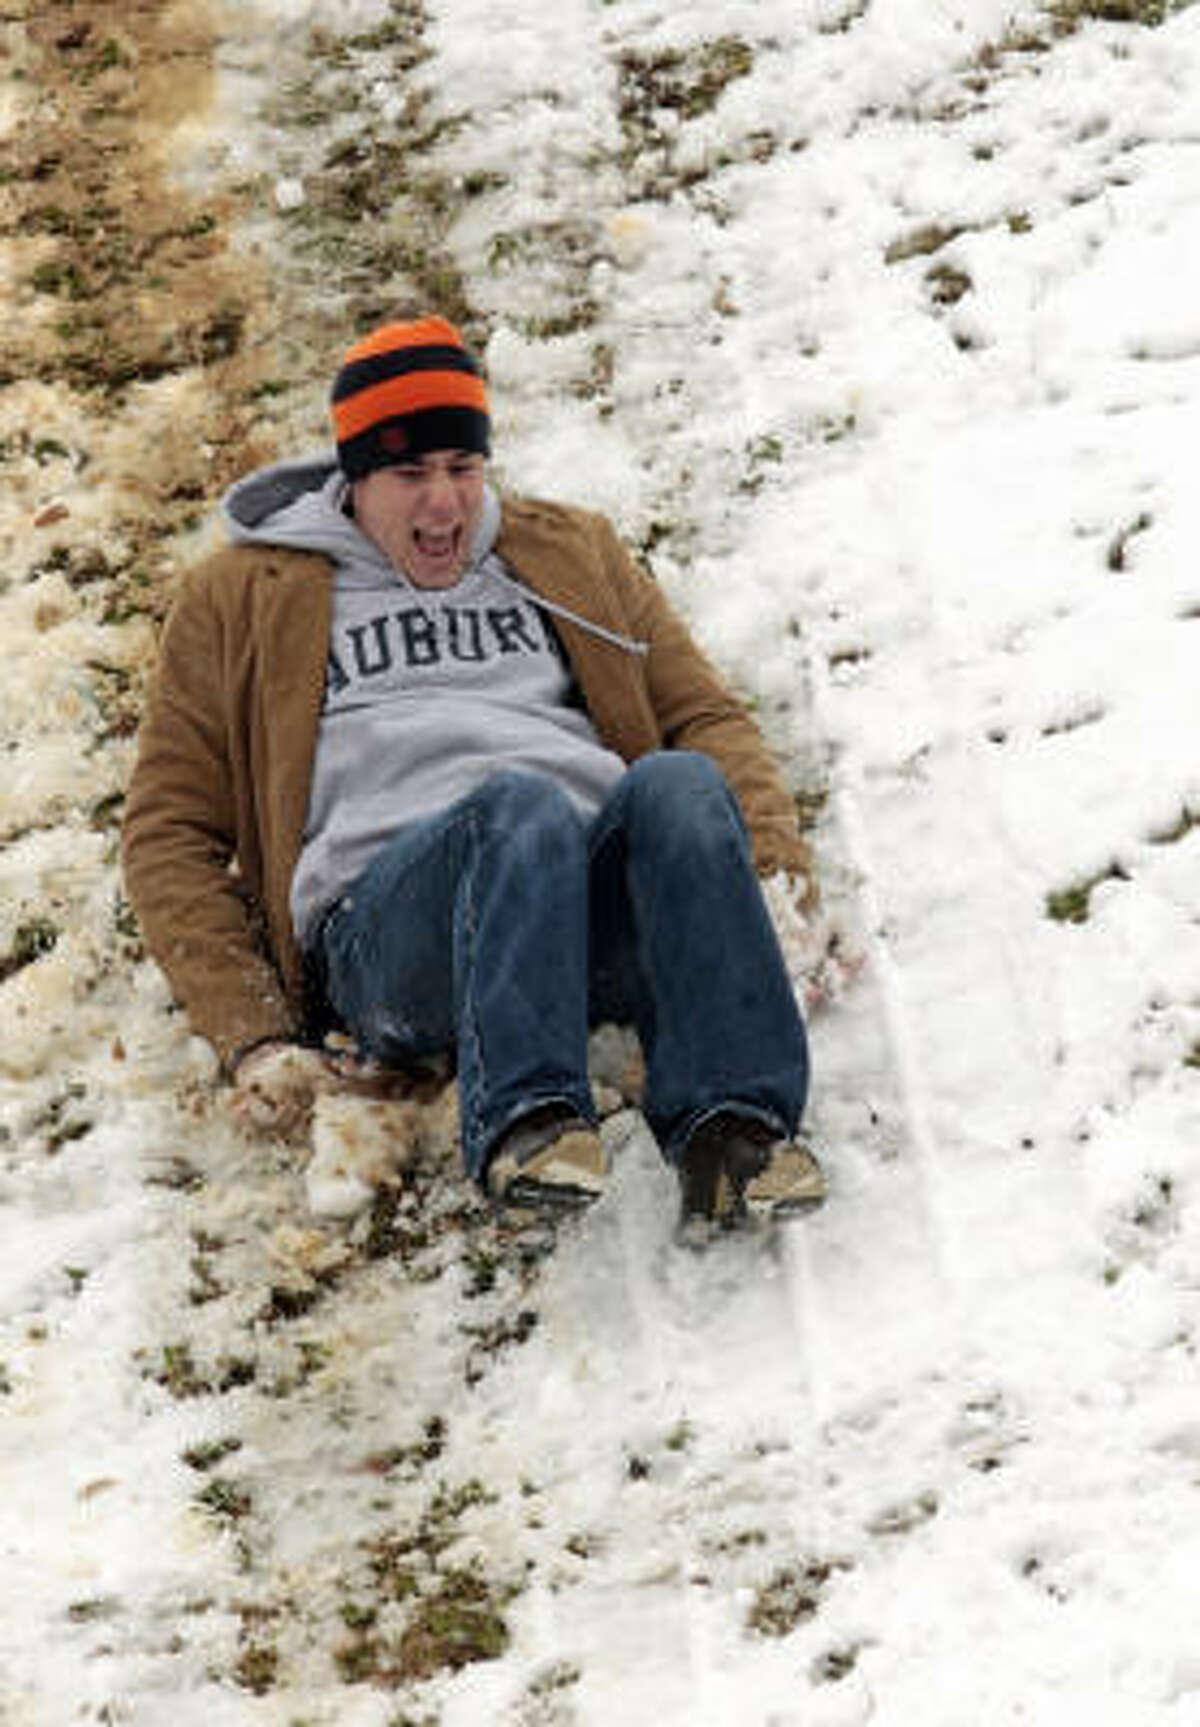 Auburn University student Patrick Duncan of Ackworth, Ga., slides down a snow covered slope on the campus in Auburn, Ala., Sunday.